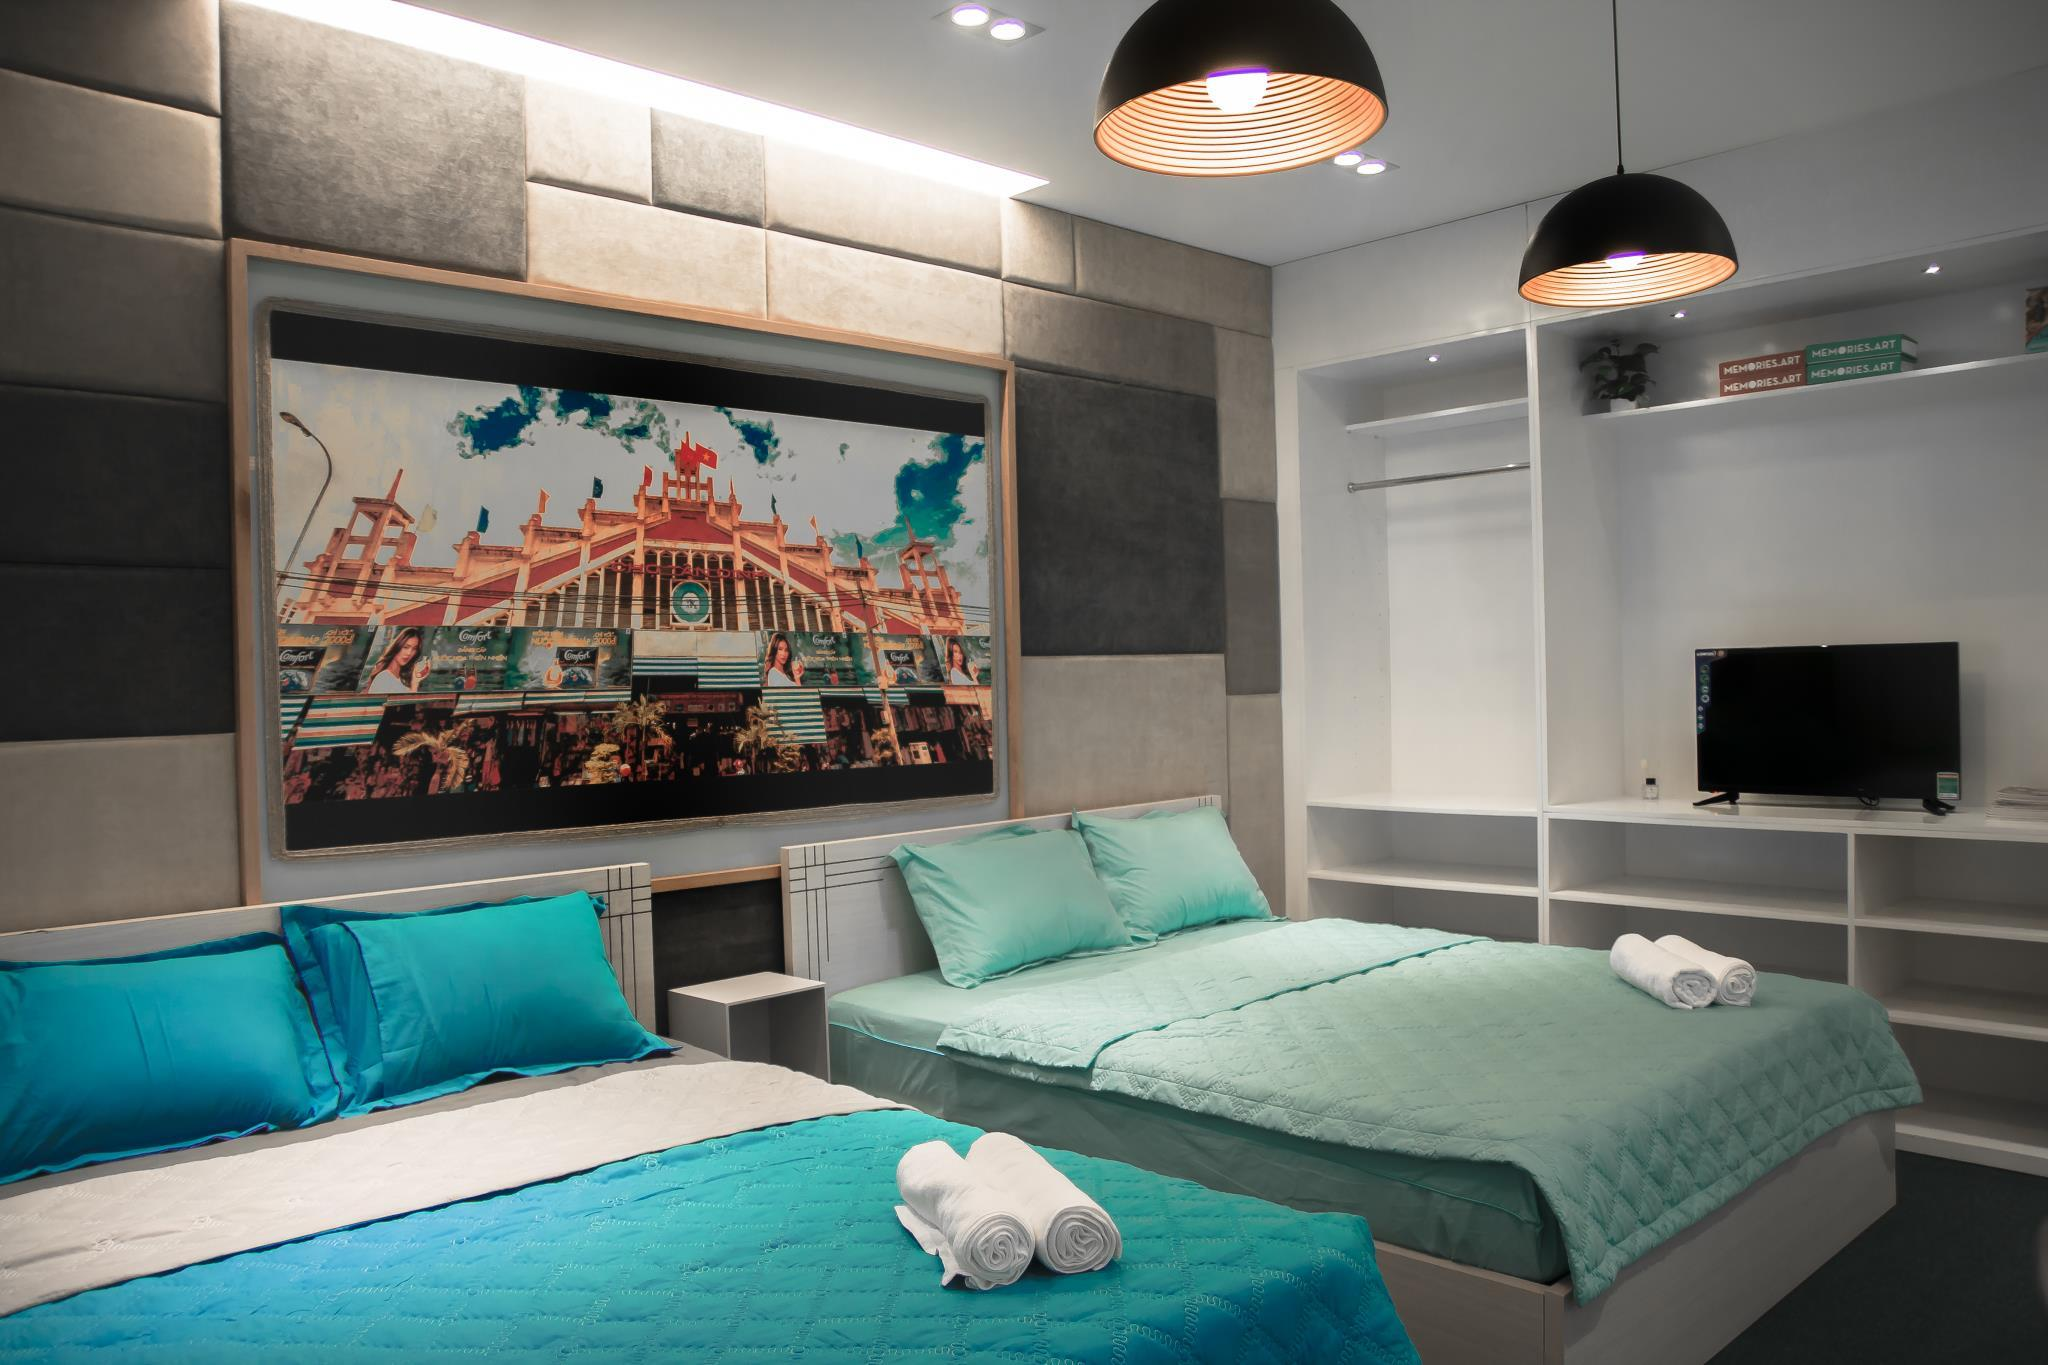 SG Tels   Sunny Room 202